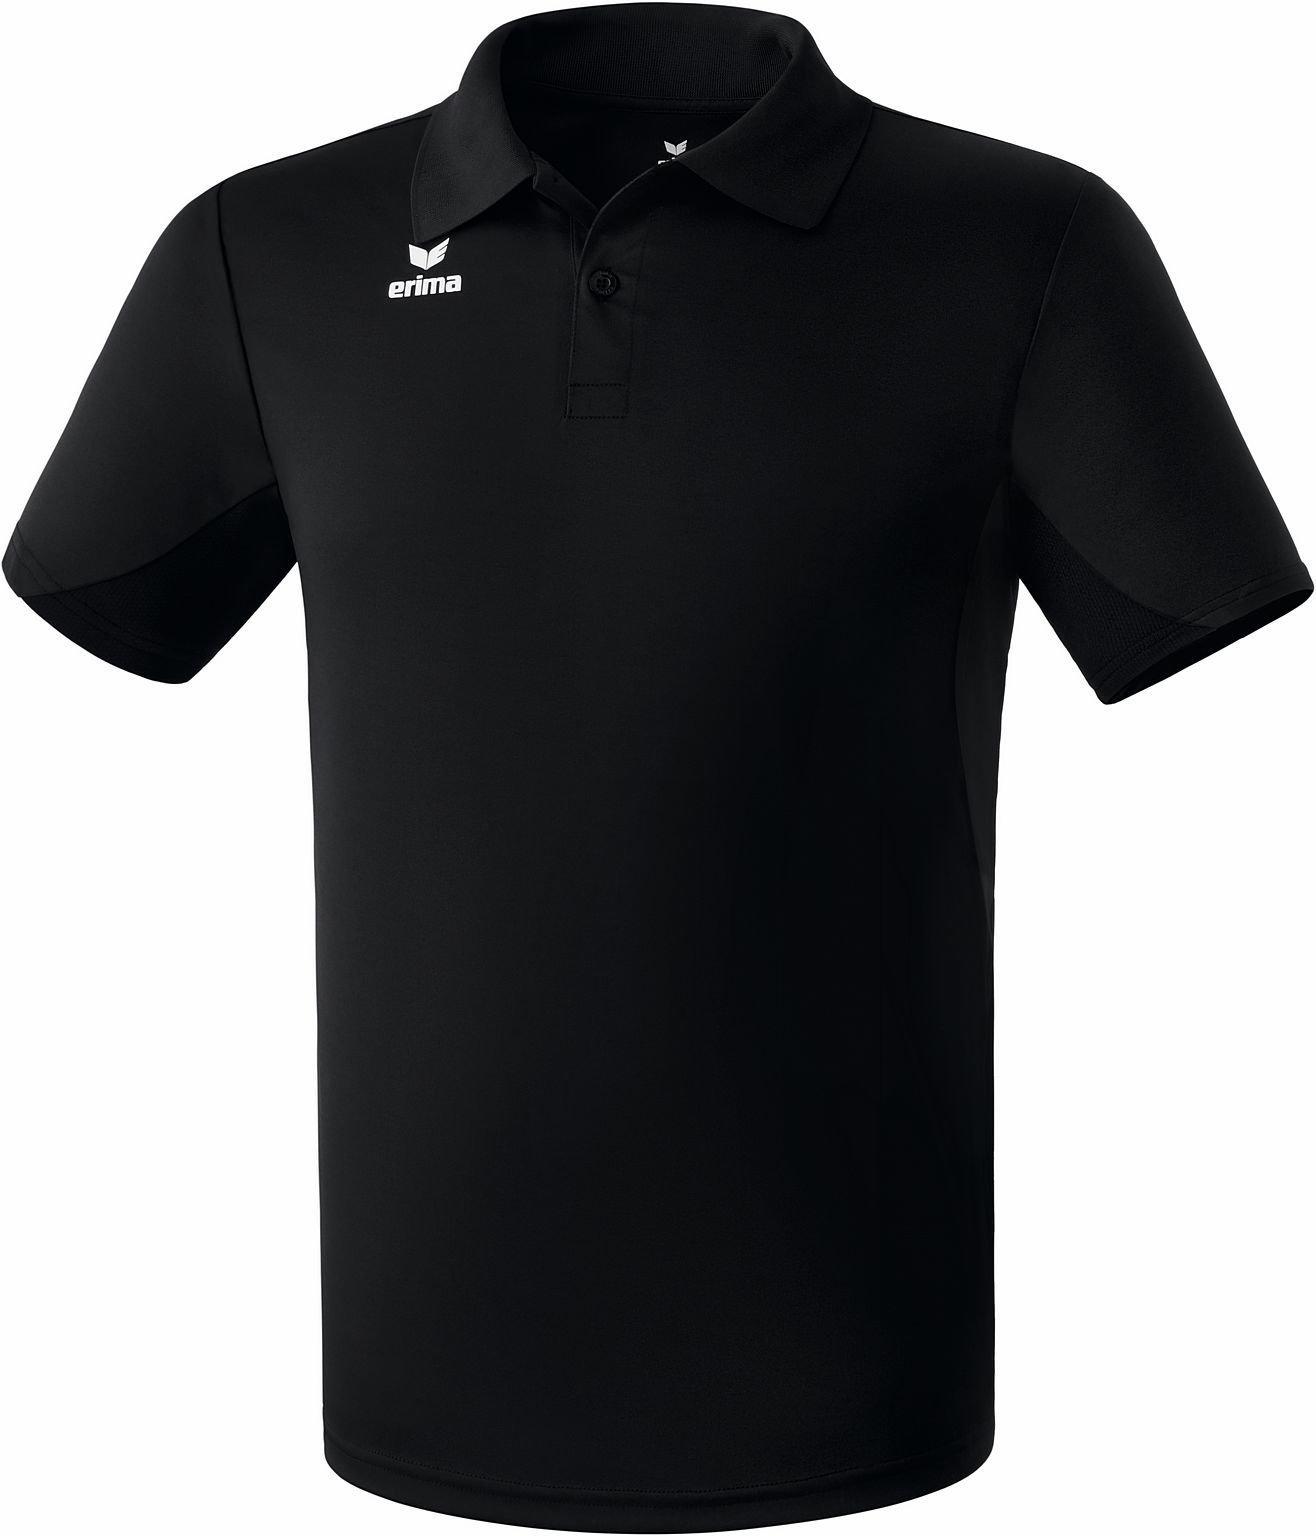 Funktions Poloshirt Herren bhc211340